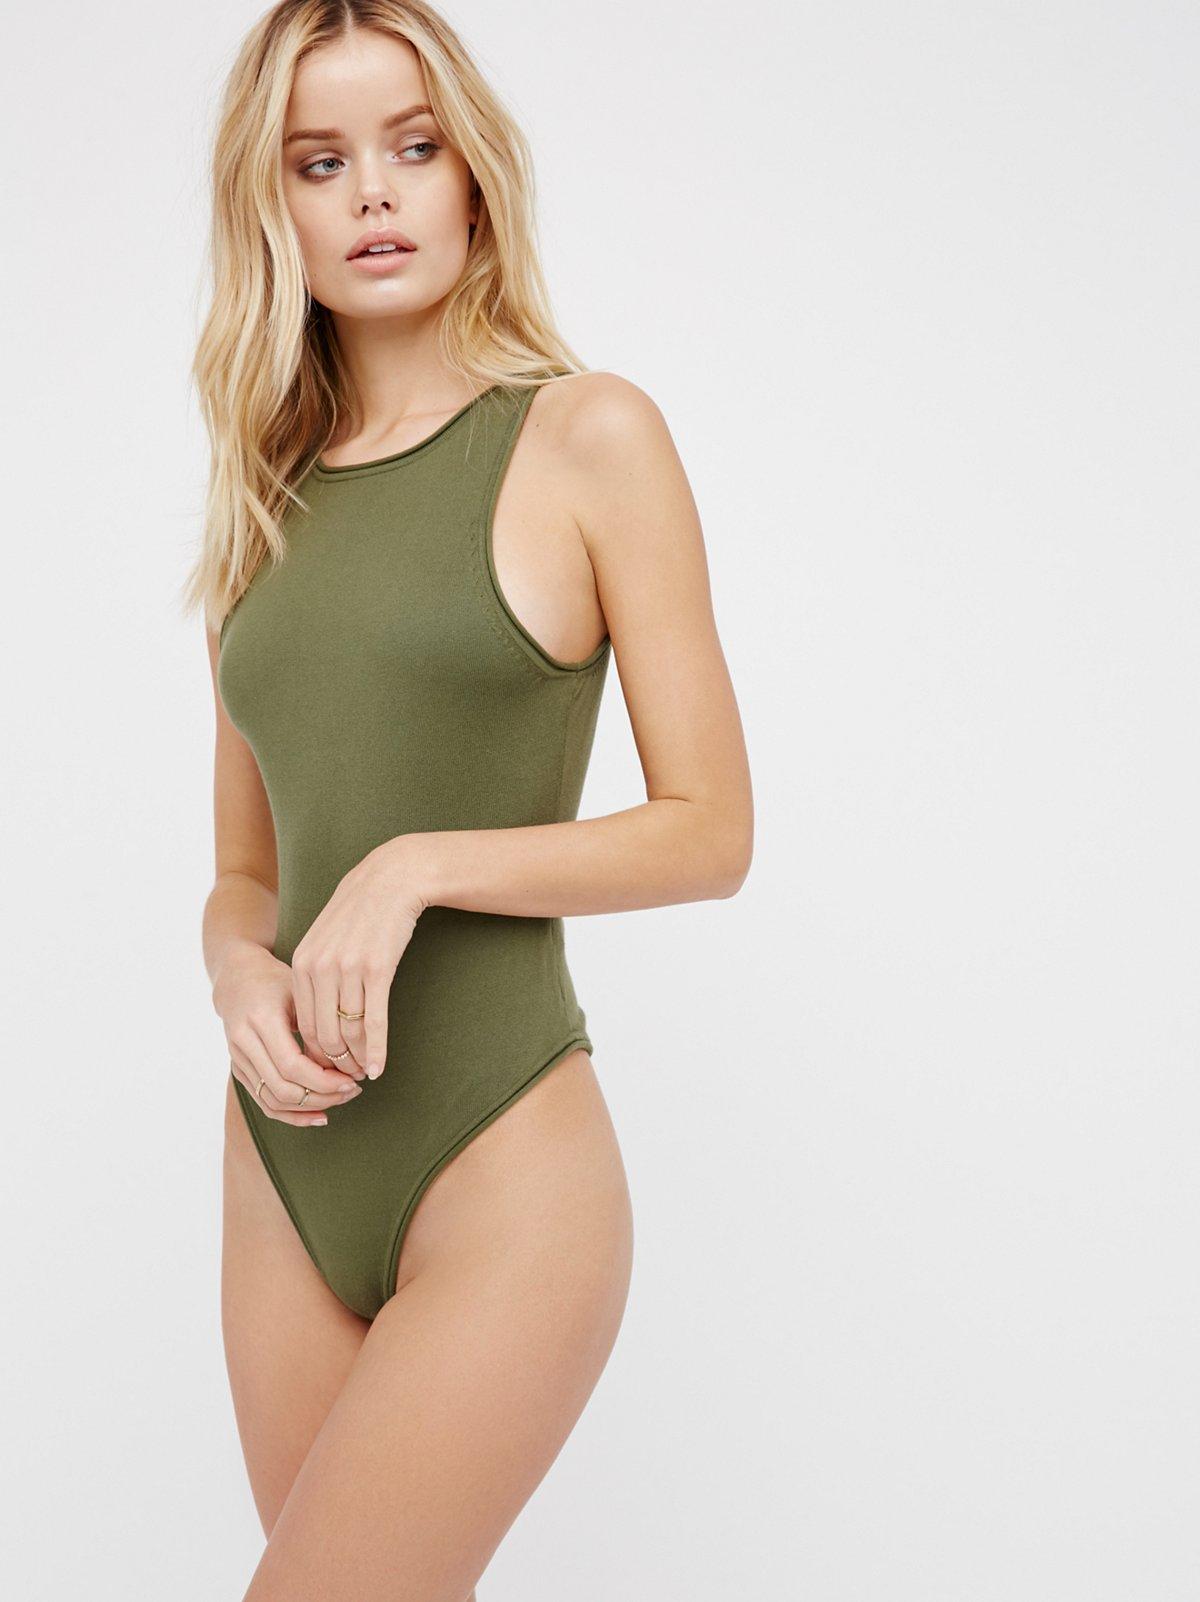 She's A Babe Bodysuit